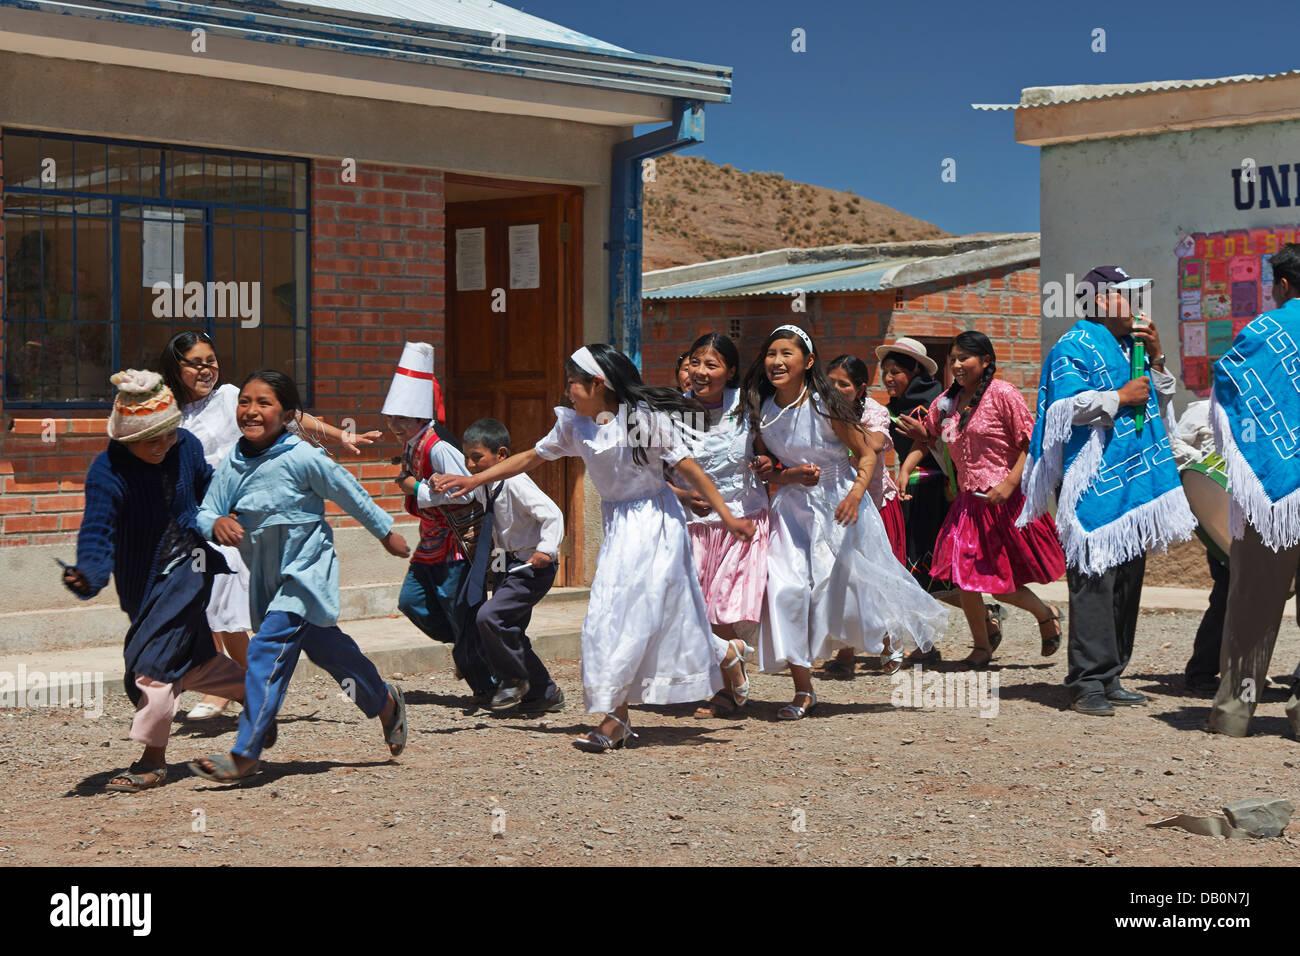 dancing indigenous Quechua children in village near San Antonio de Lipez, Andes, Bolivia, South America - Stock Image